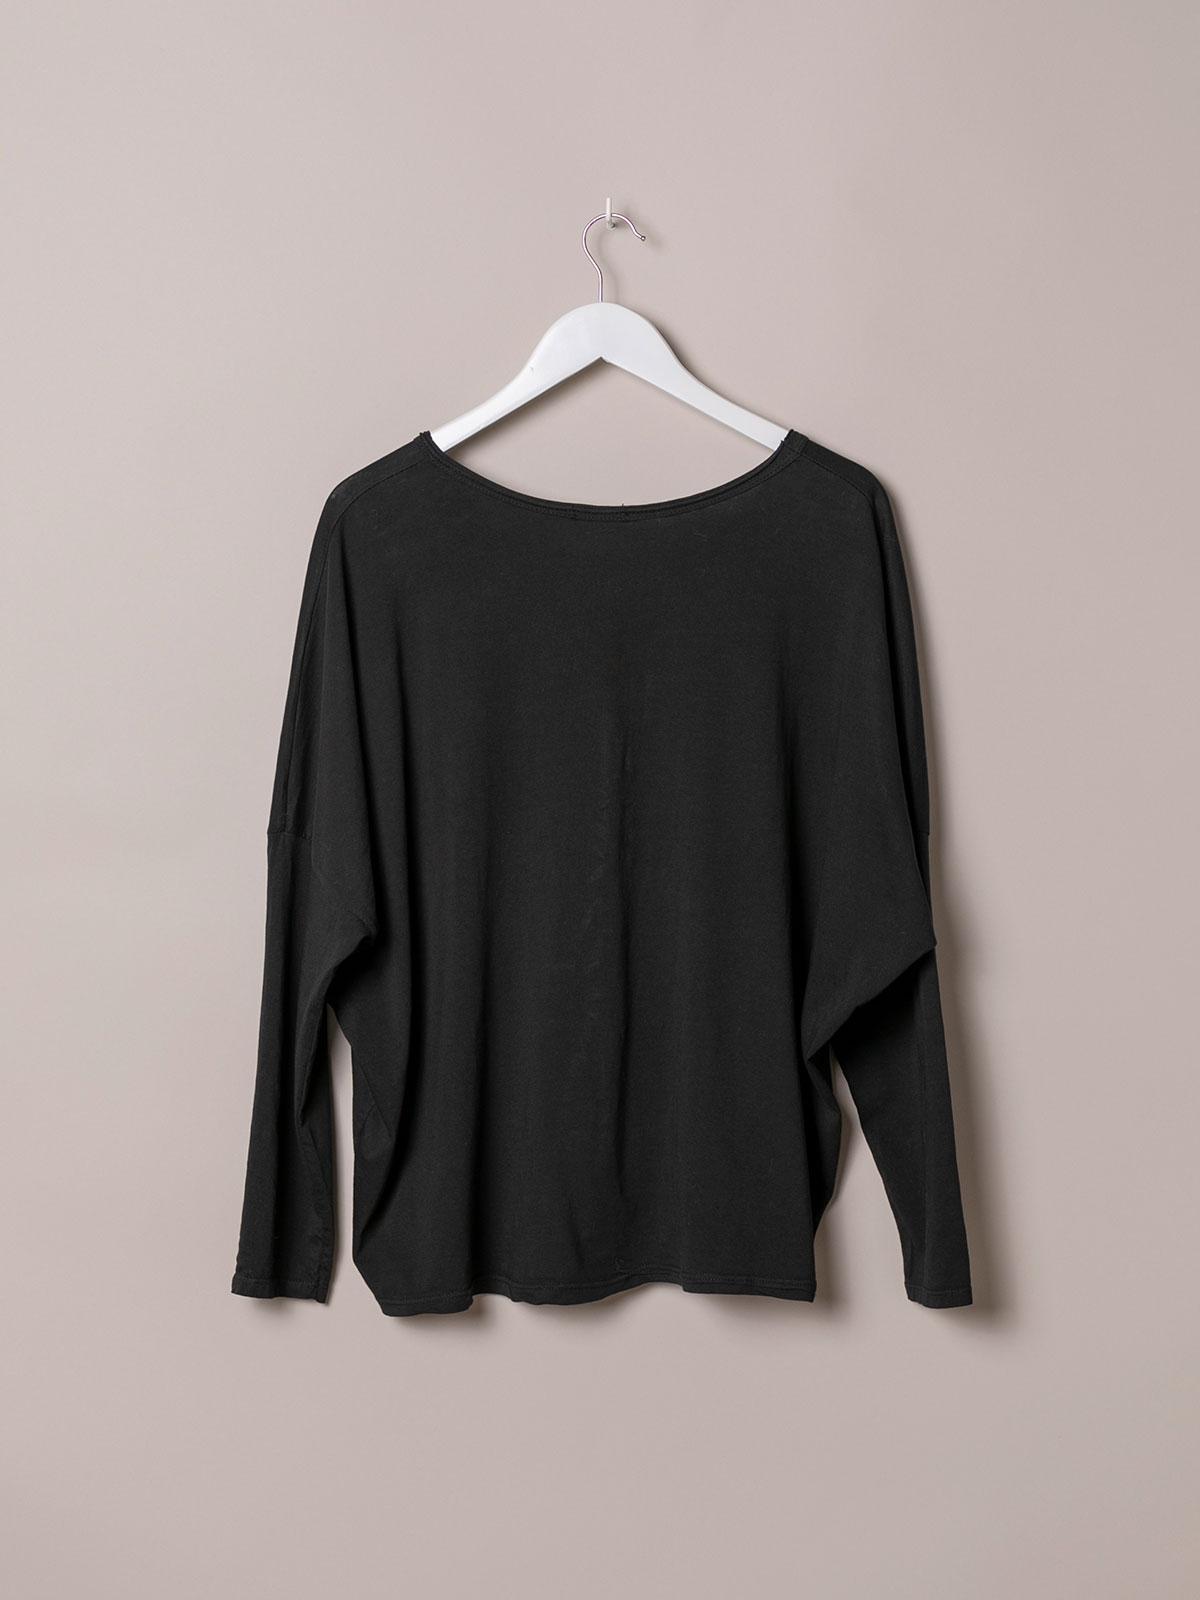 Camiseta mujer algodón lisa cuello pico Negro